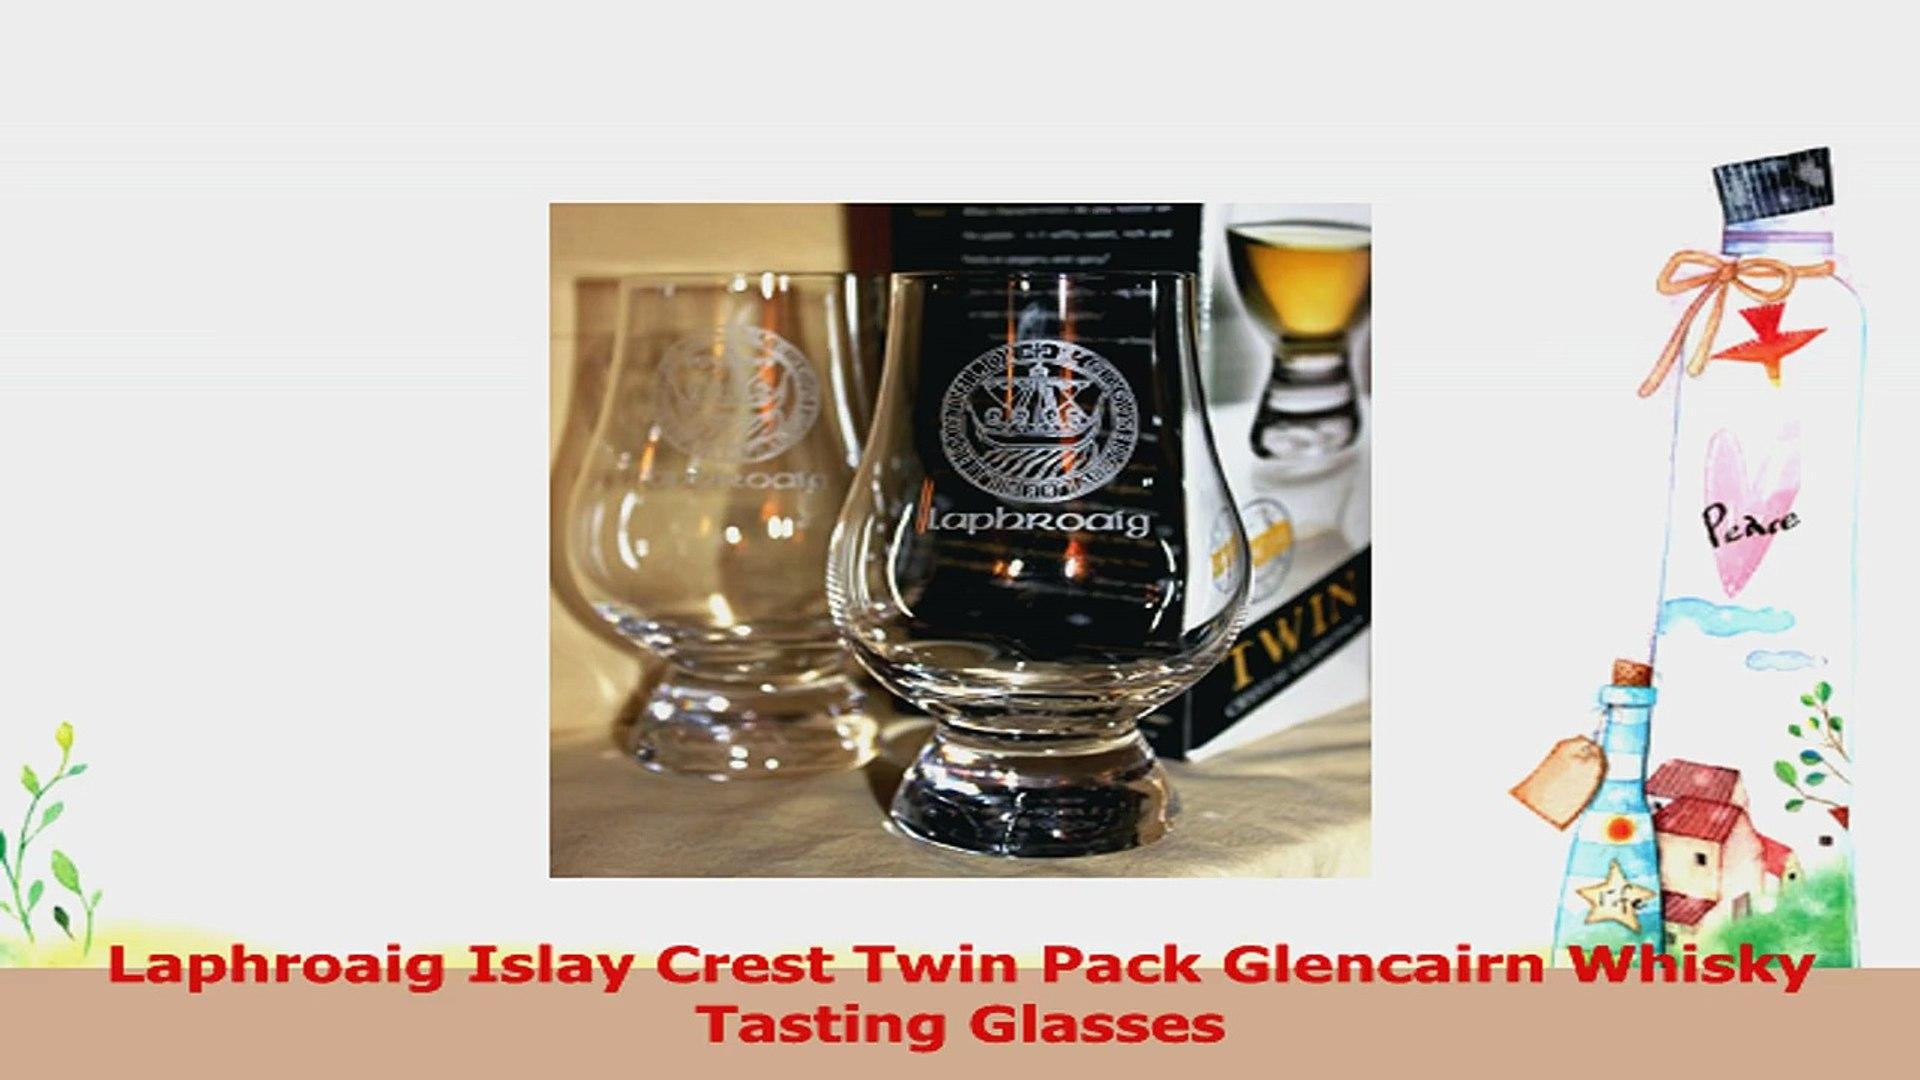 LAPHROAIG ISLAY CREST TWIN PACK GLENCAIRN SCOTCH WHISKY TASTING GLASSES